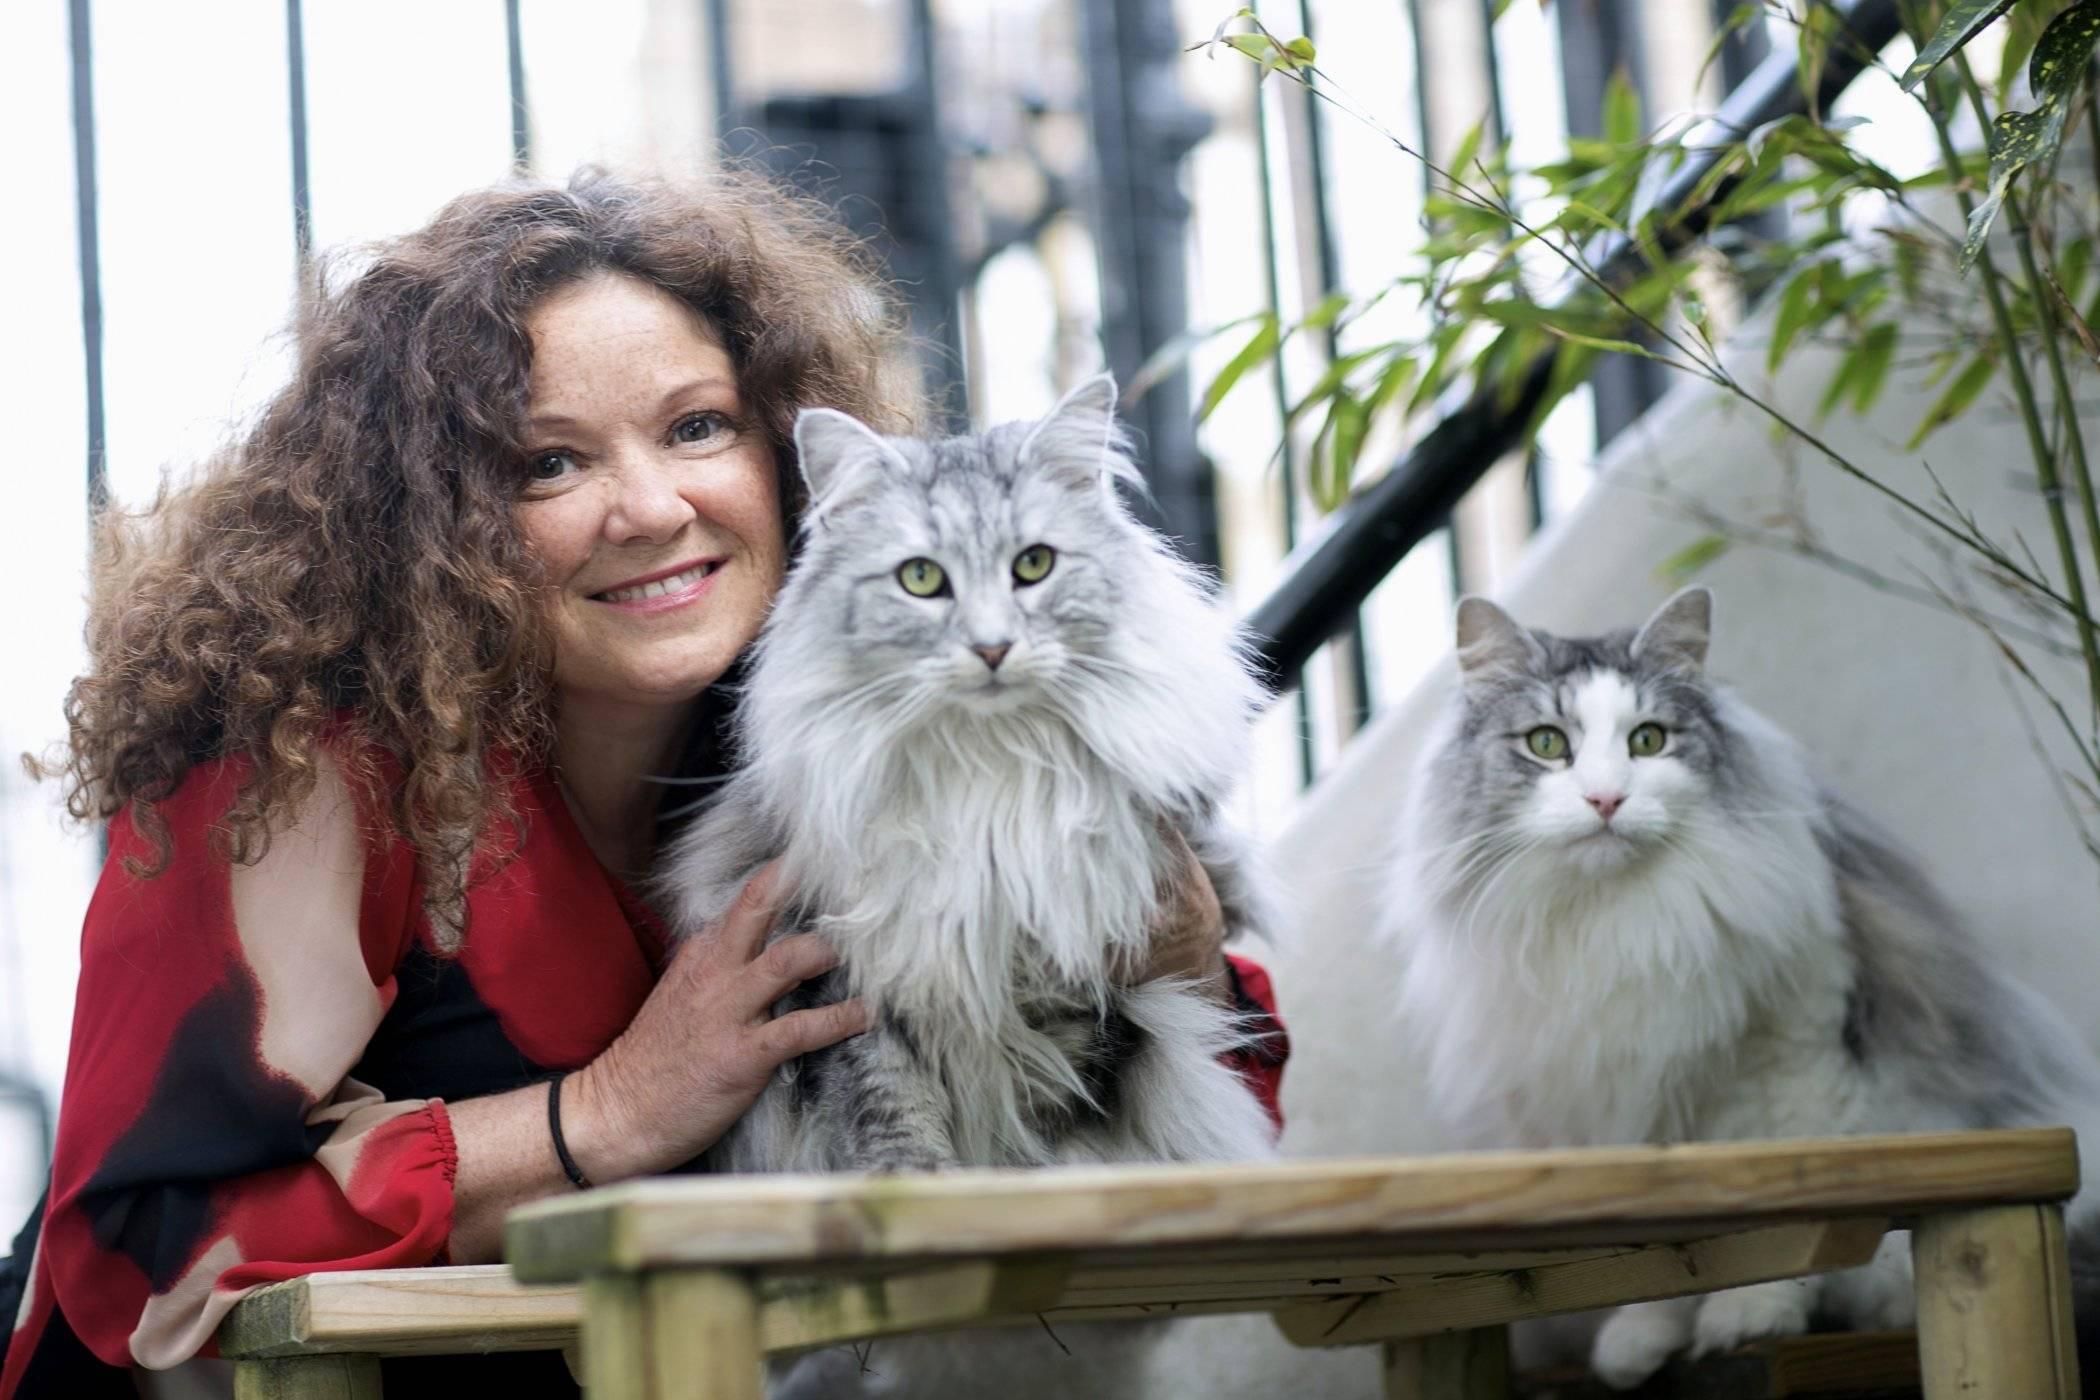 indoor cat behavior advice for parents